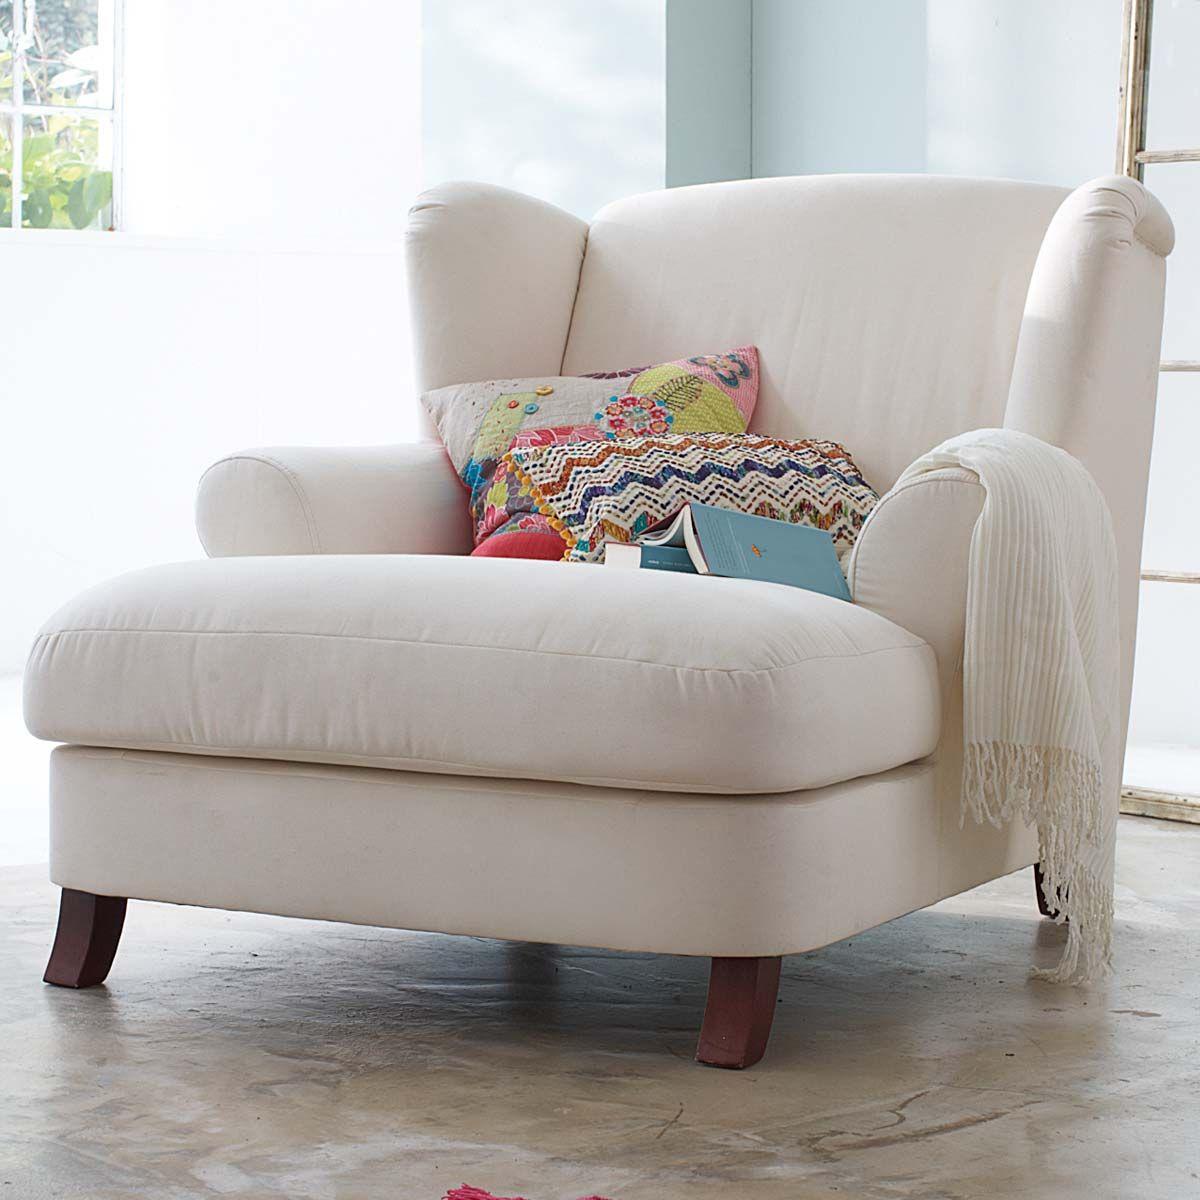 dream chair (via somewhere north) To build a home